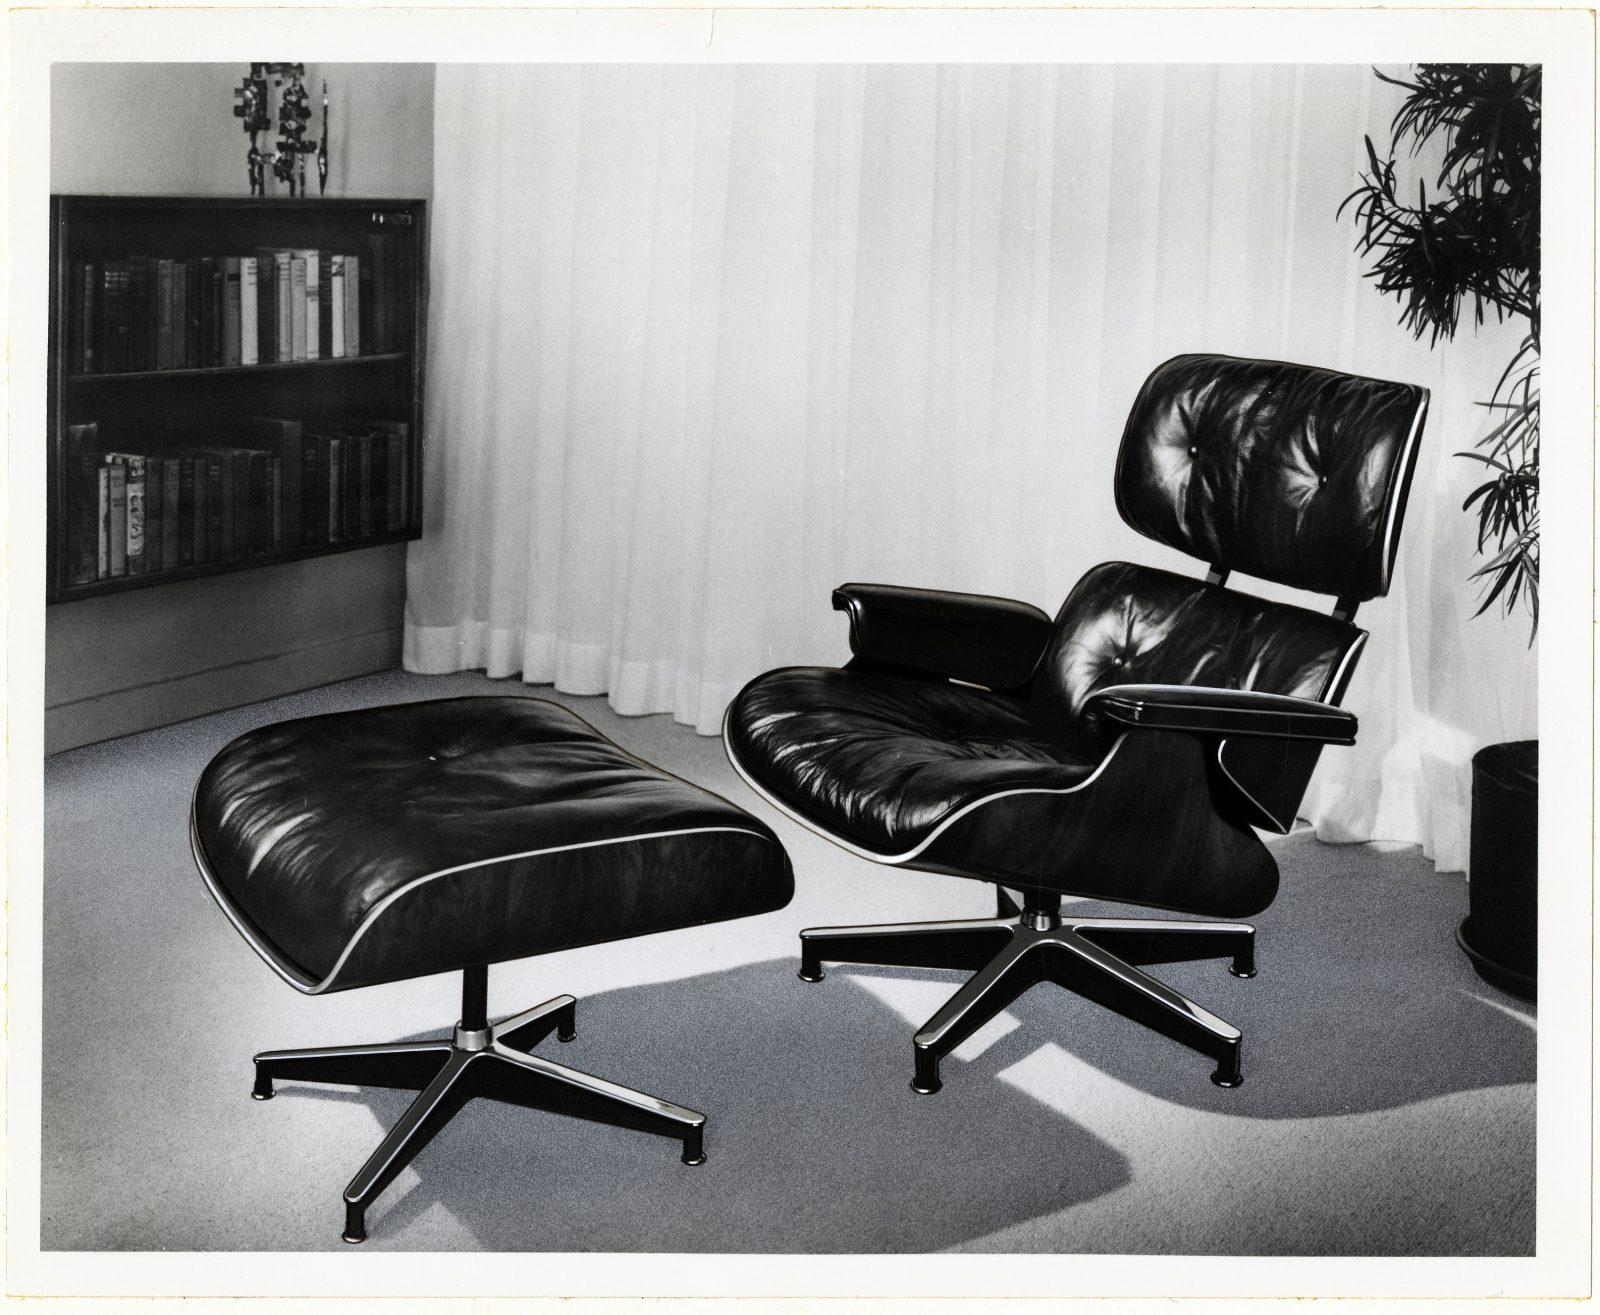 24 HM Eames 670 1956